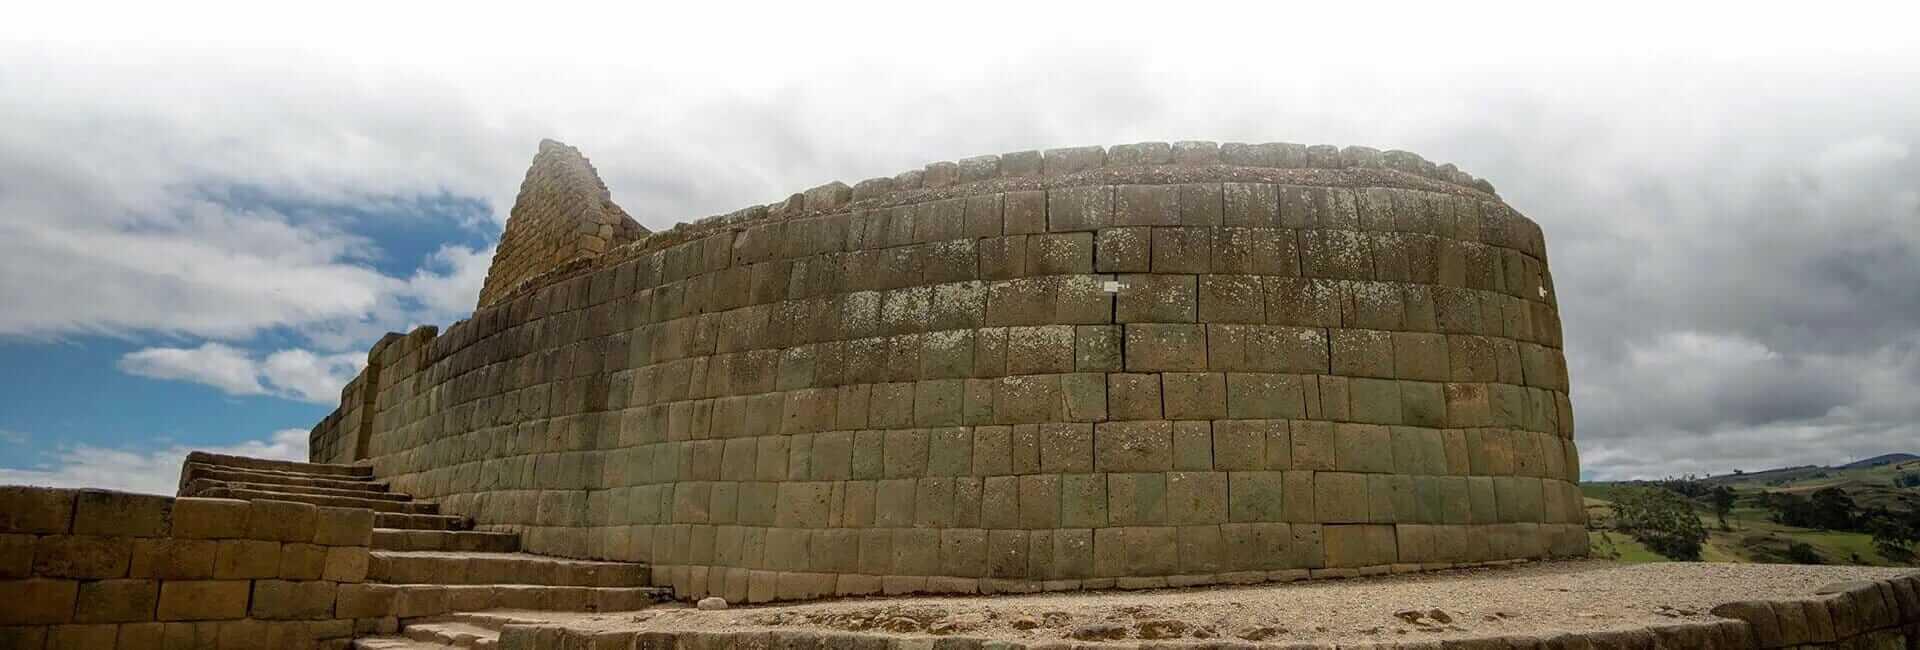 ingapirca ruins inca wall ecuador